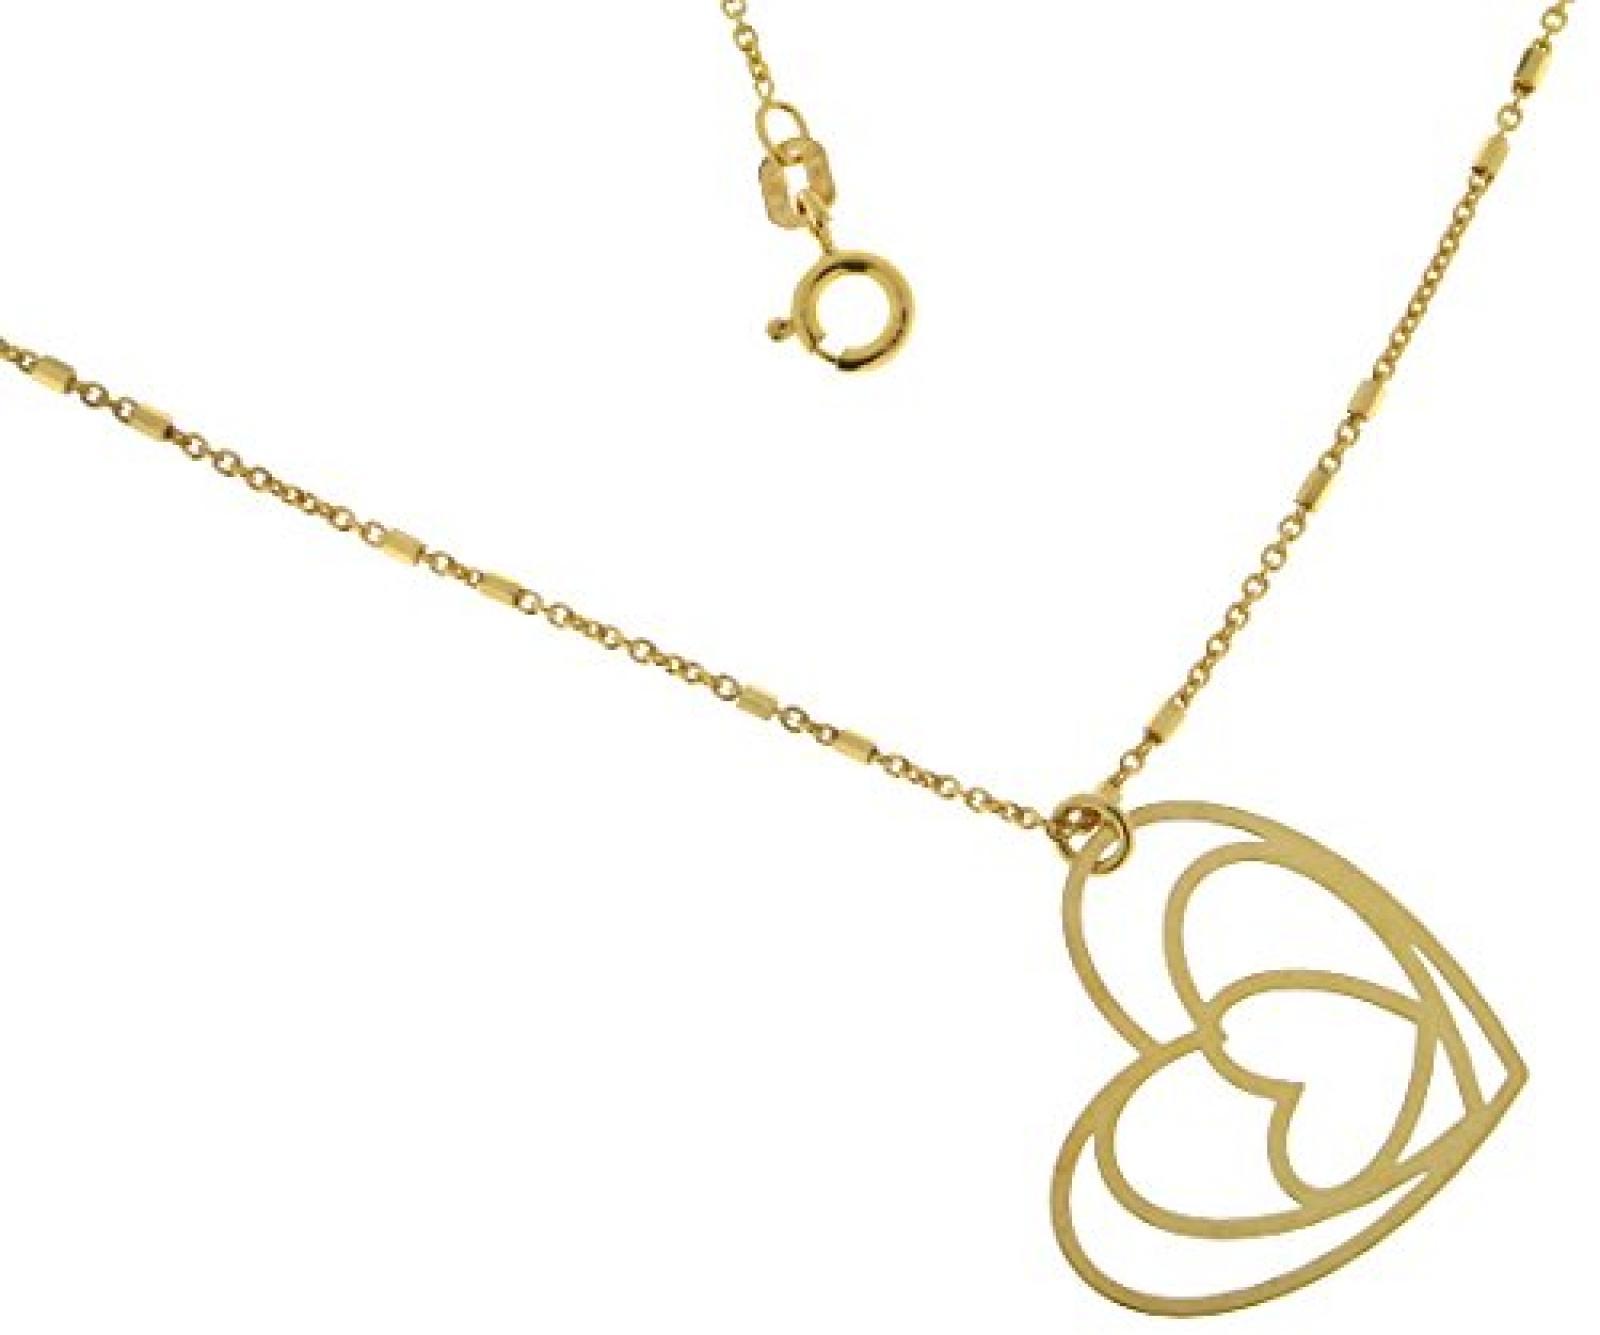 Kettenworld Damen Halskette 925 Sterling Silber 325611